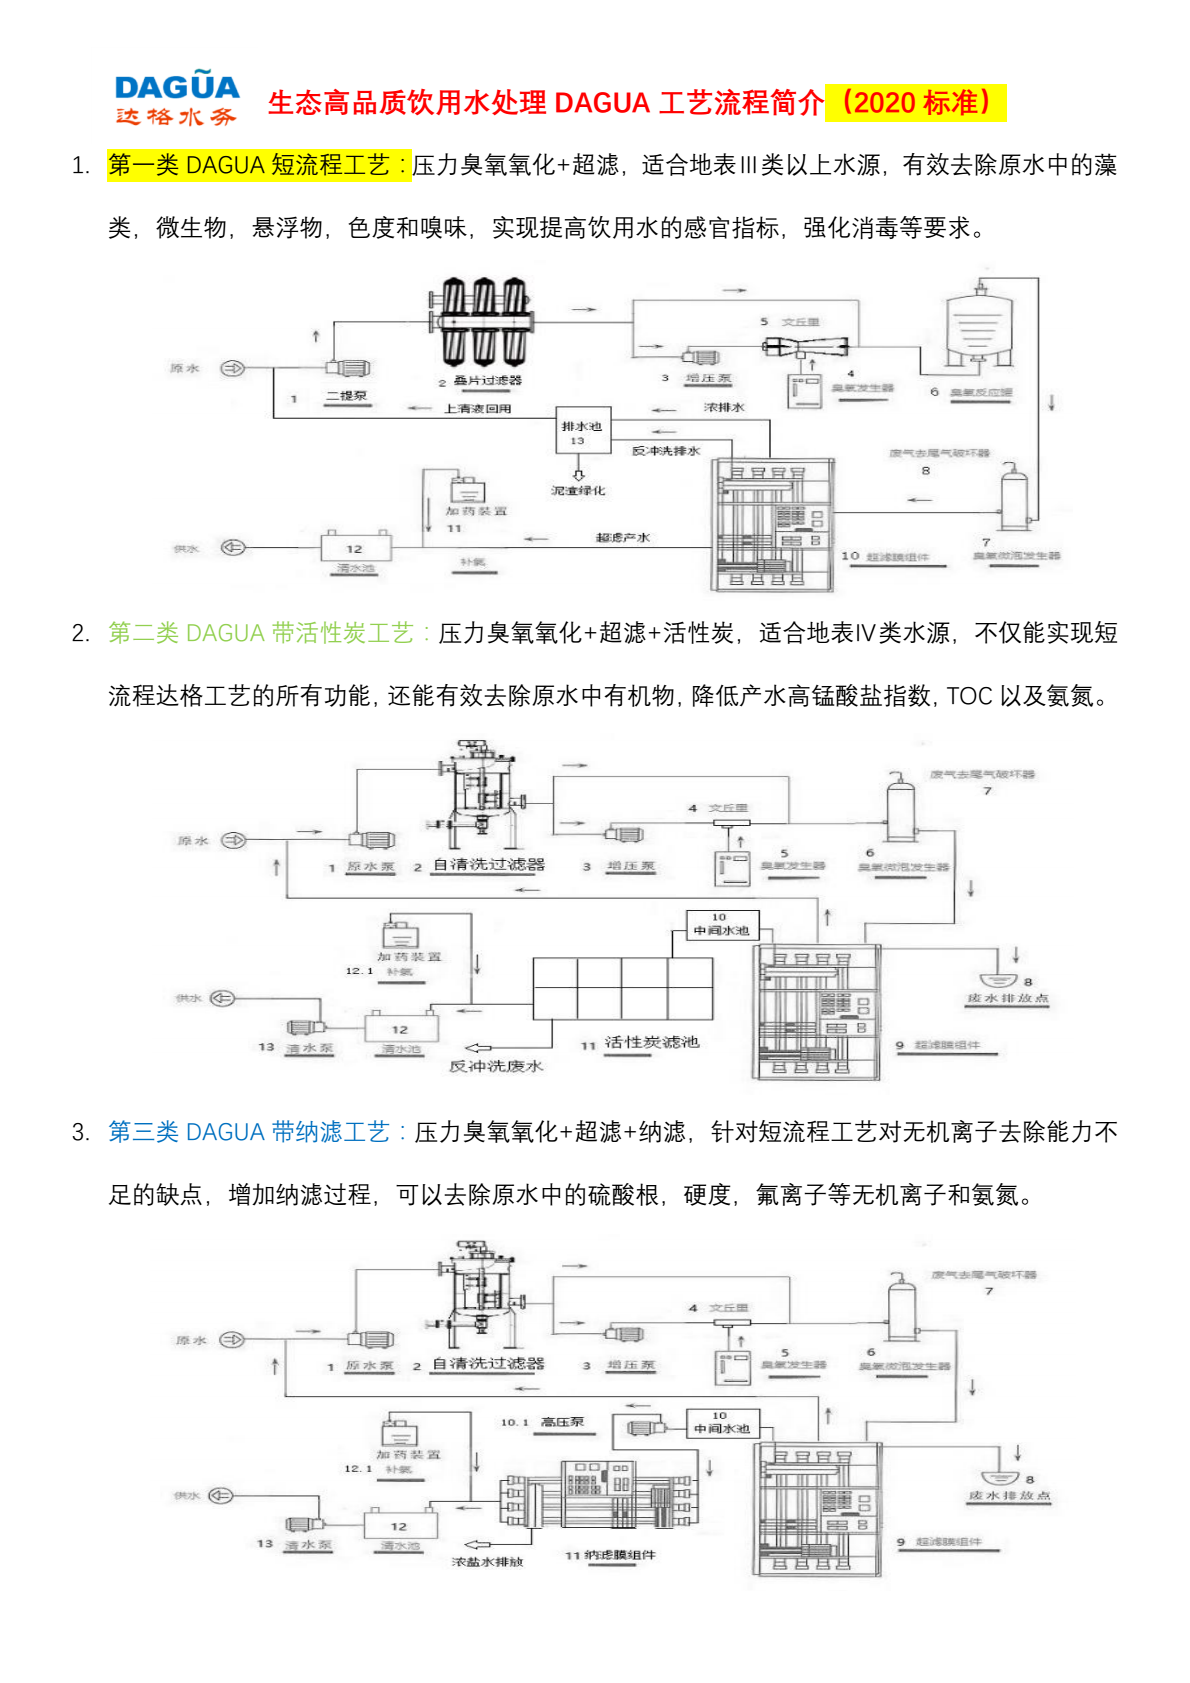 DAGUA生态高品质饮用水处理工艺流程简介.png